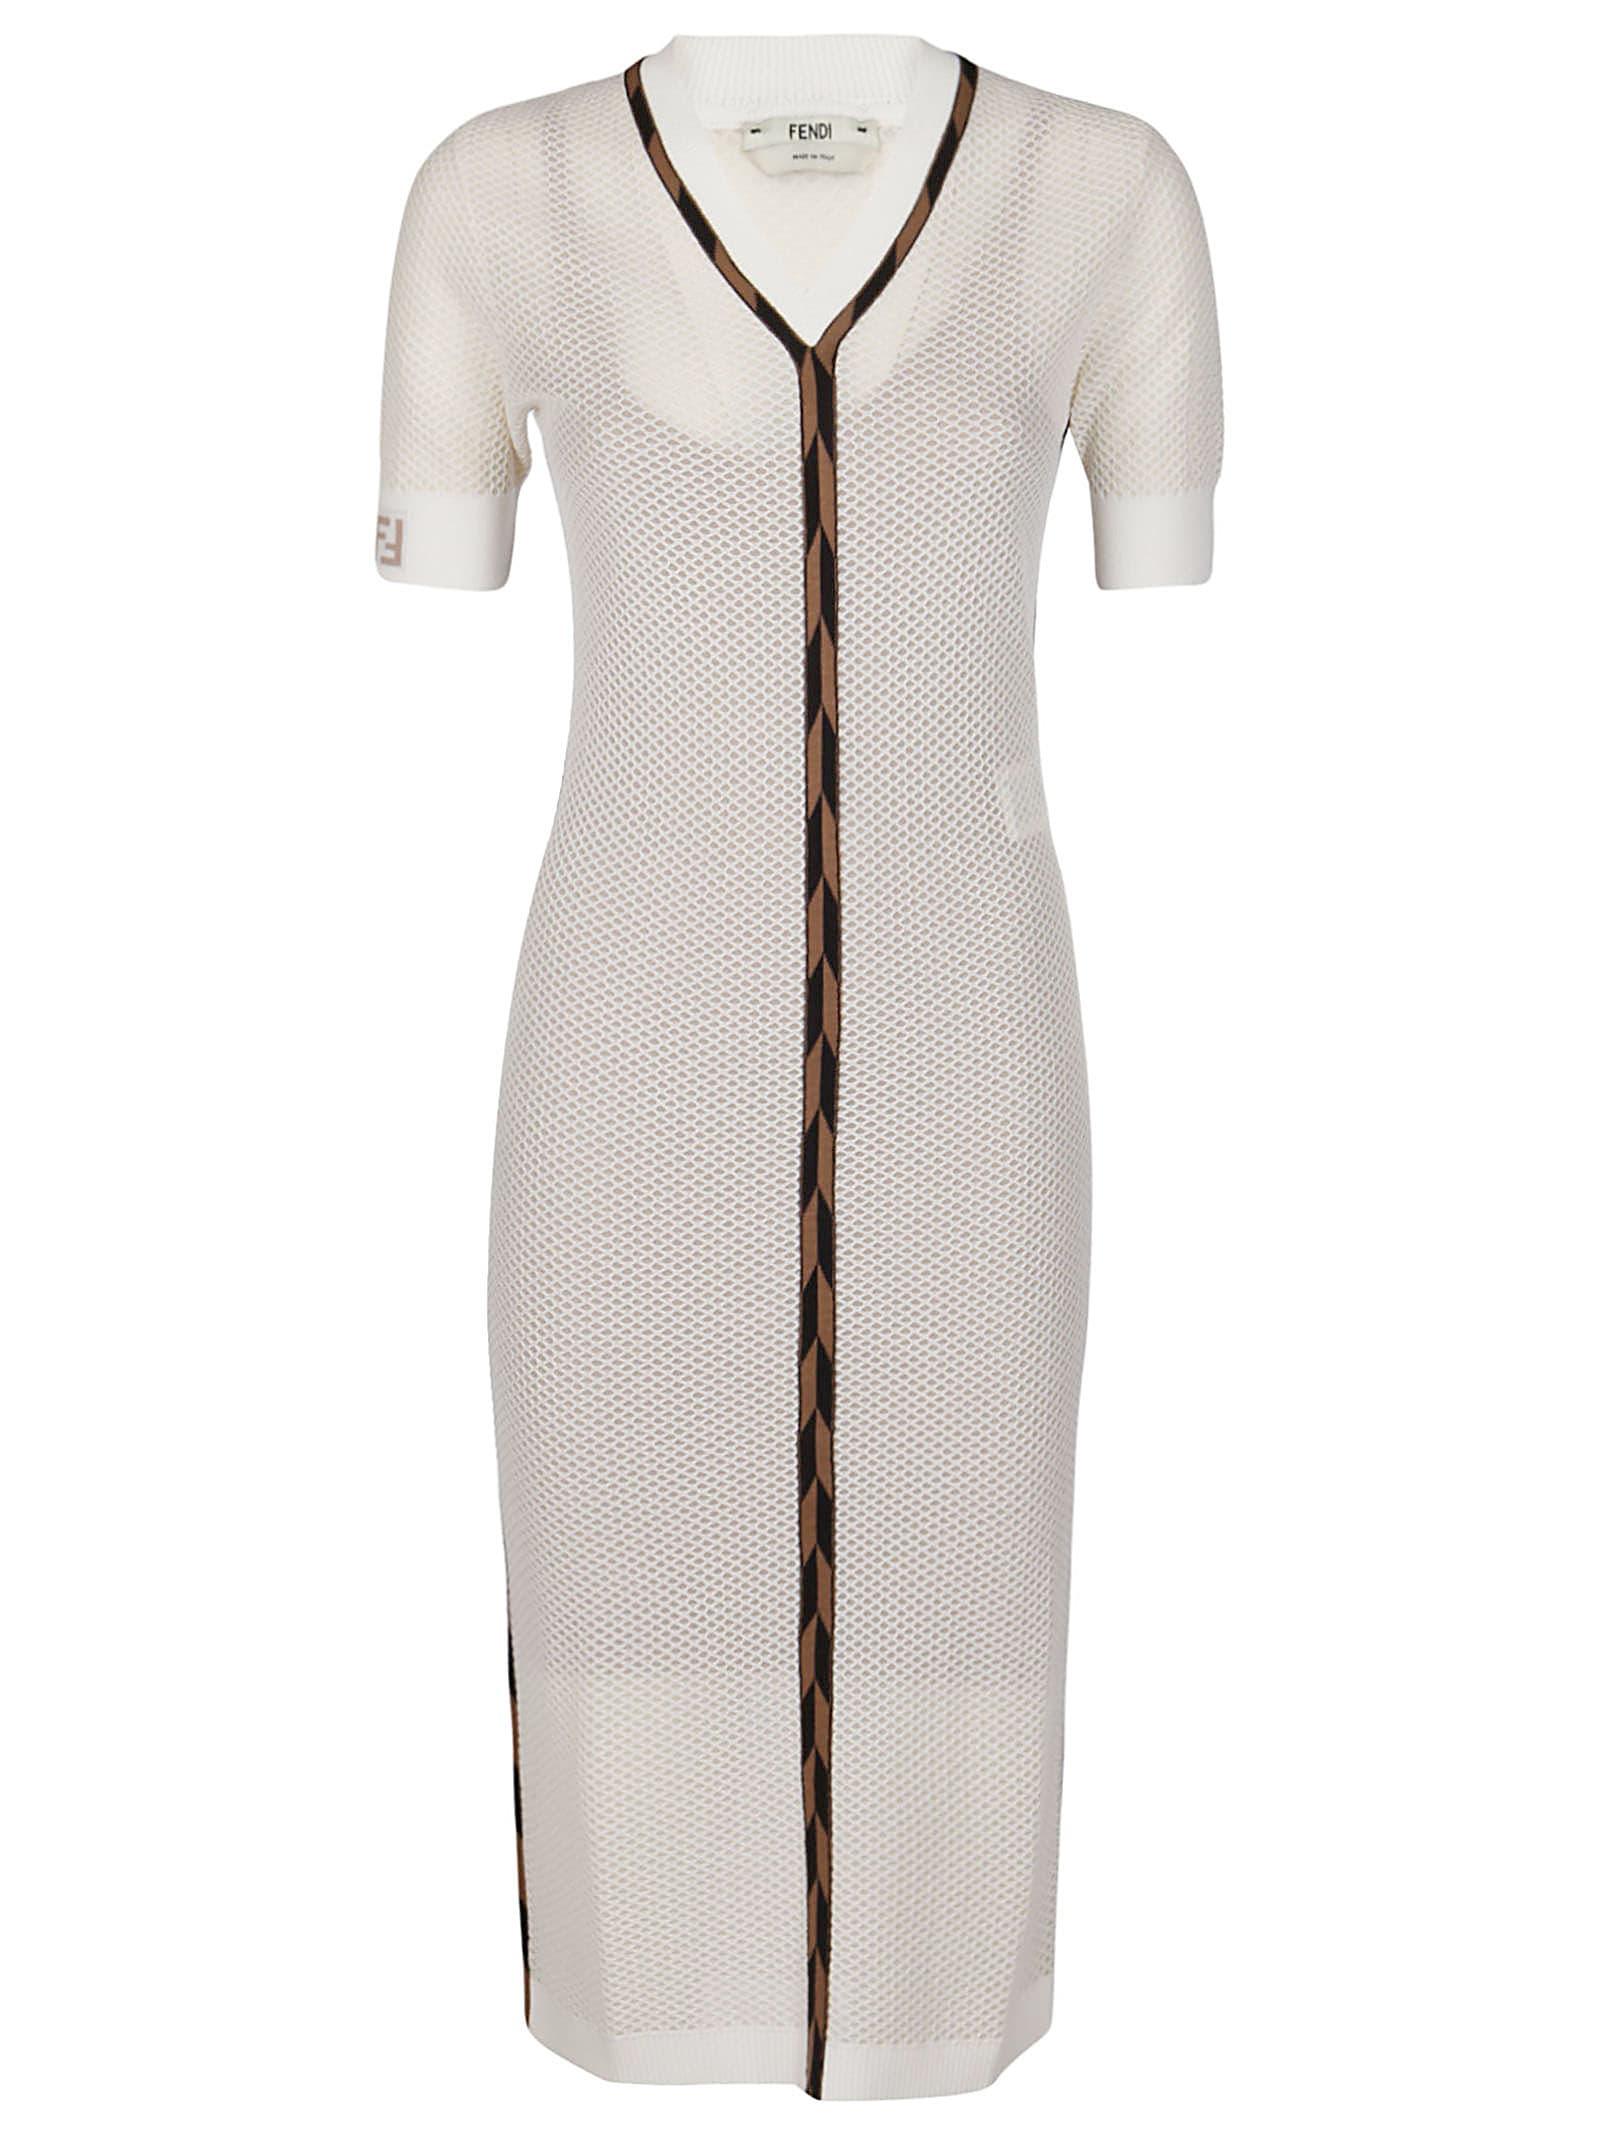 Buy Fendi White Viscose Blend Dress online, shop Fendi with free shipping